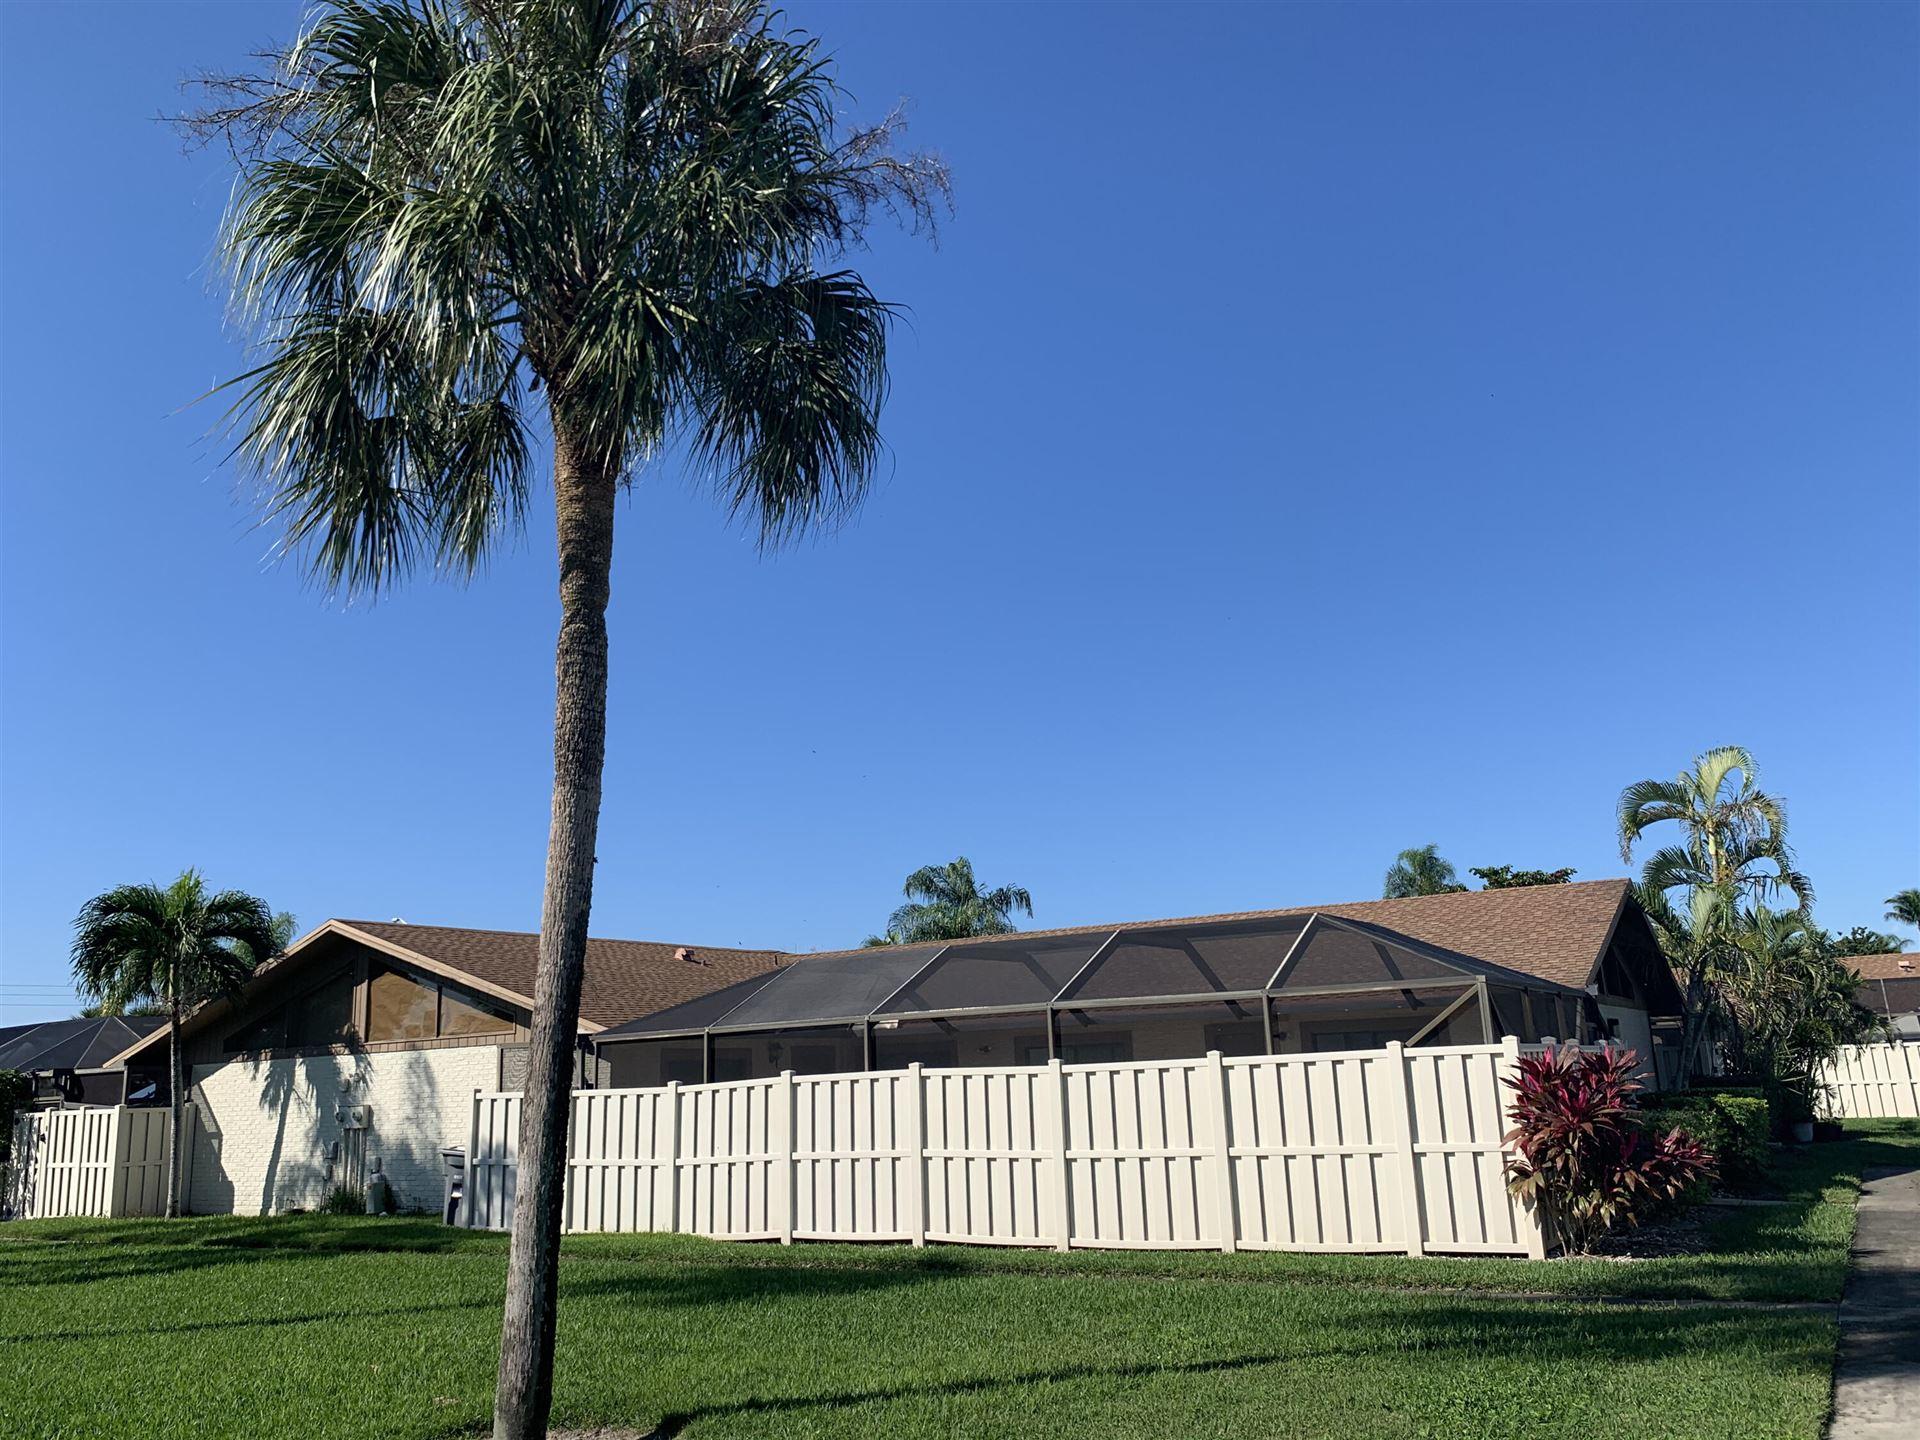 9986 Boca Gardens Trail #C, Boca Raton, FL 33496 - MLS#: RX-10732354